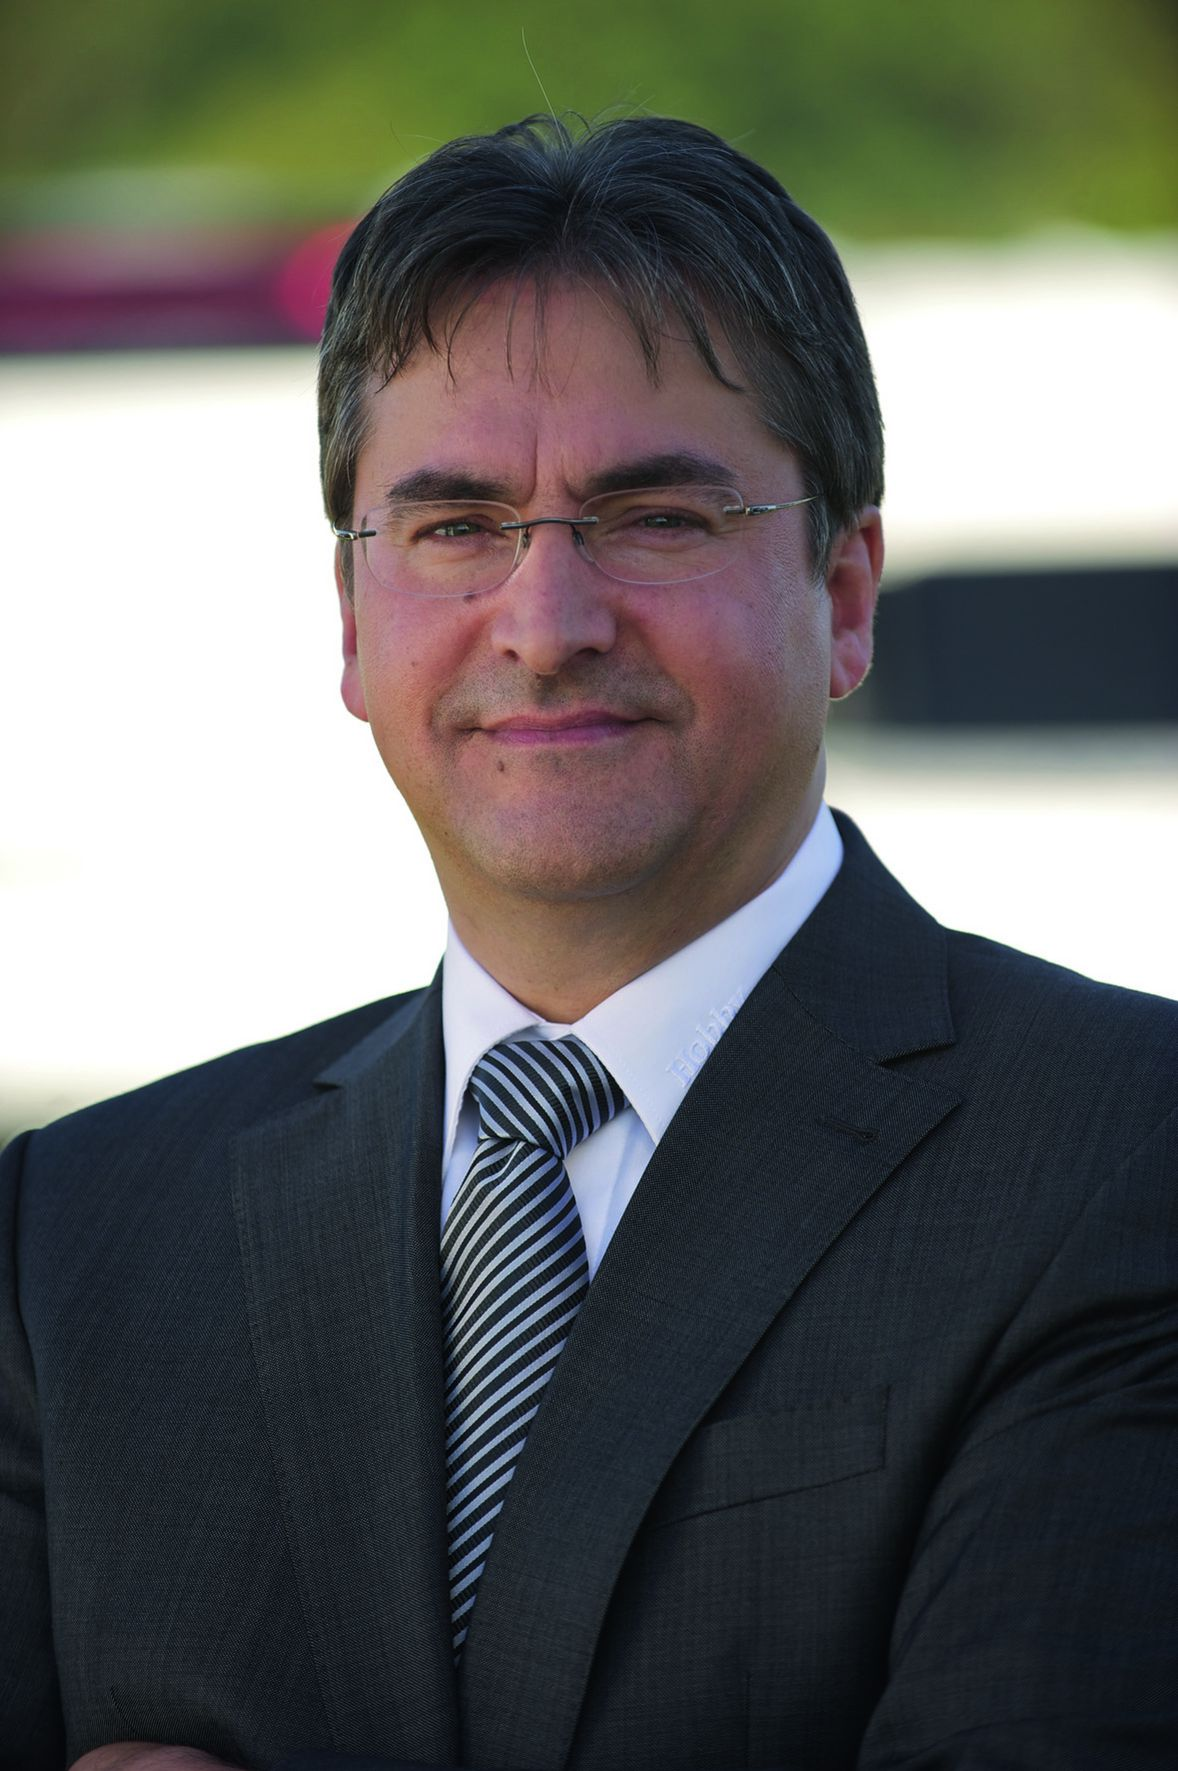 Hobby-Geschäftsführer Klaus Dieter Böcker verstärkt CIVD-Vorstand. © spothits/Hobby